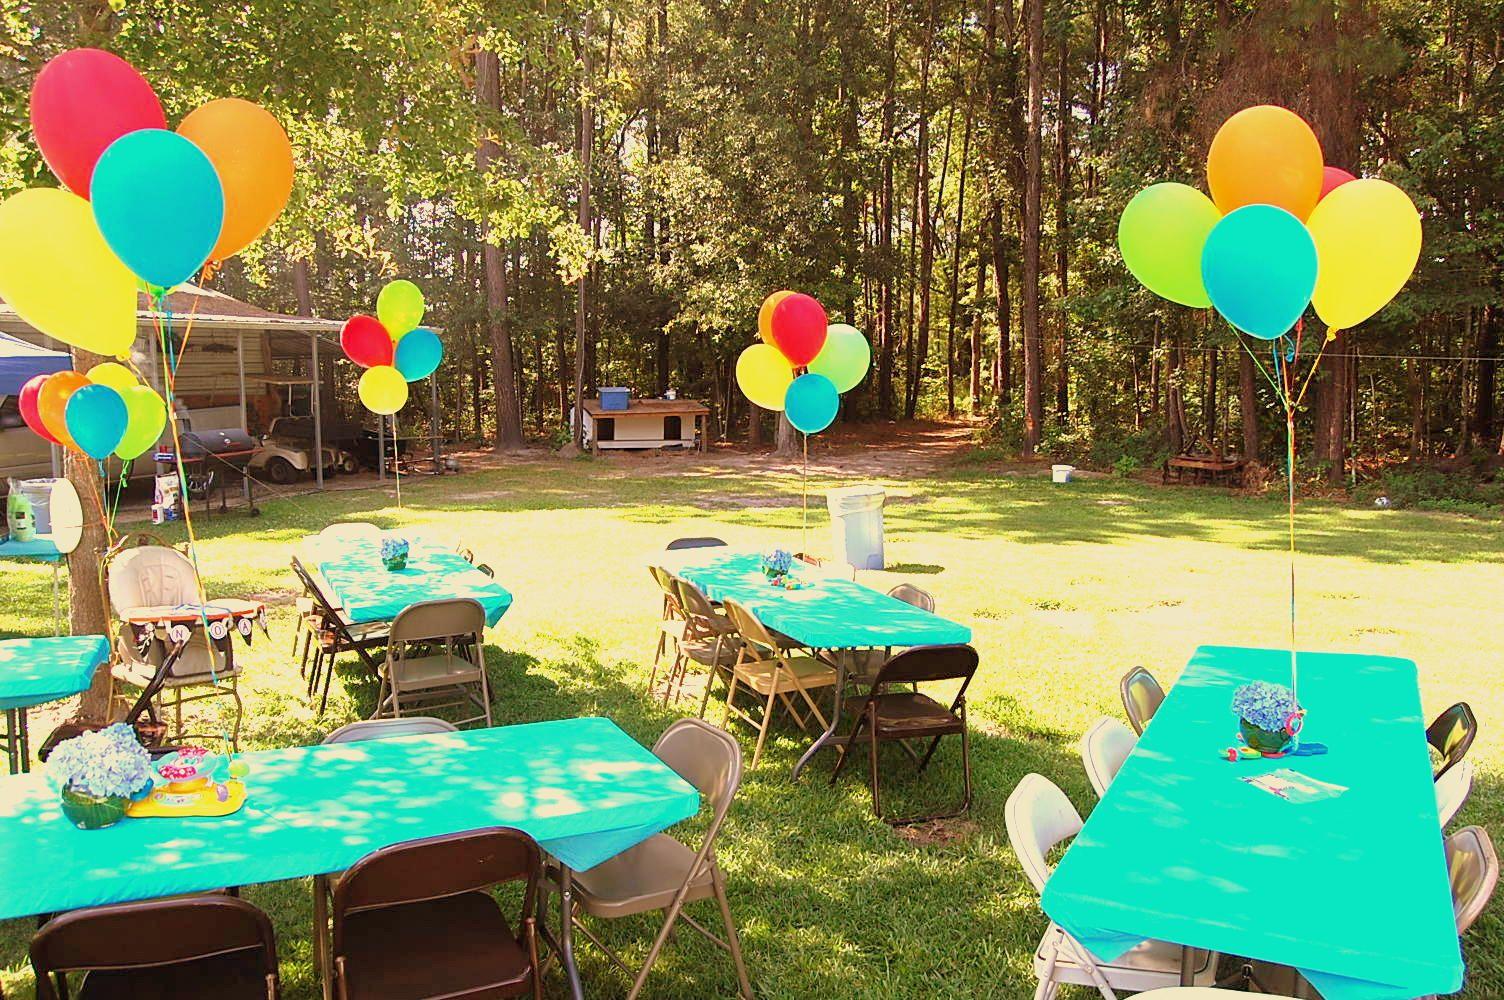 Backyard cookout/pool party setup